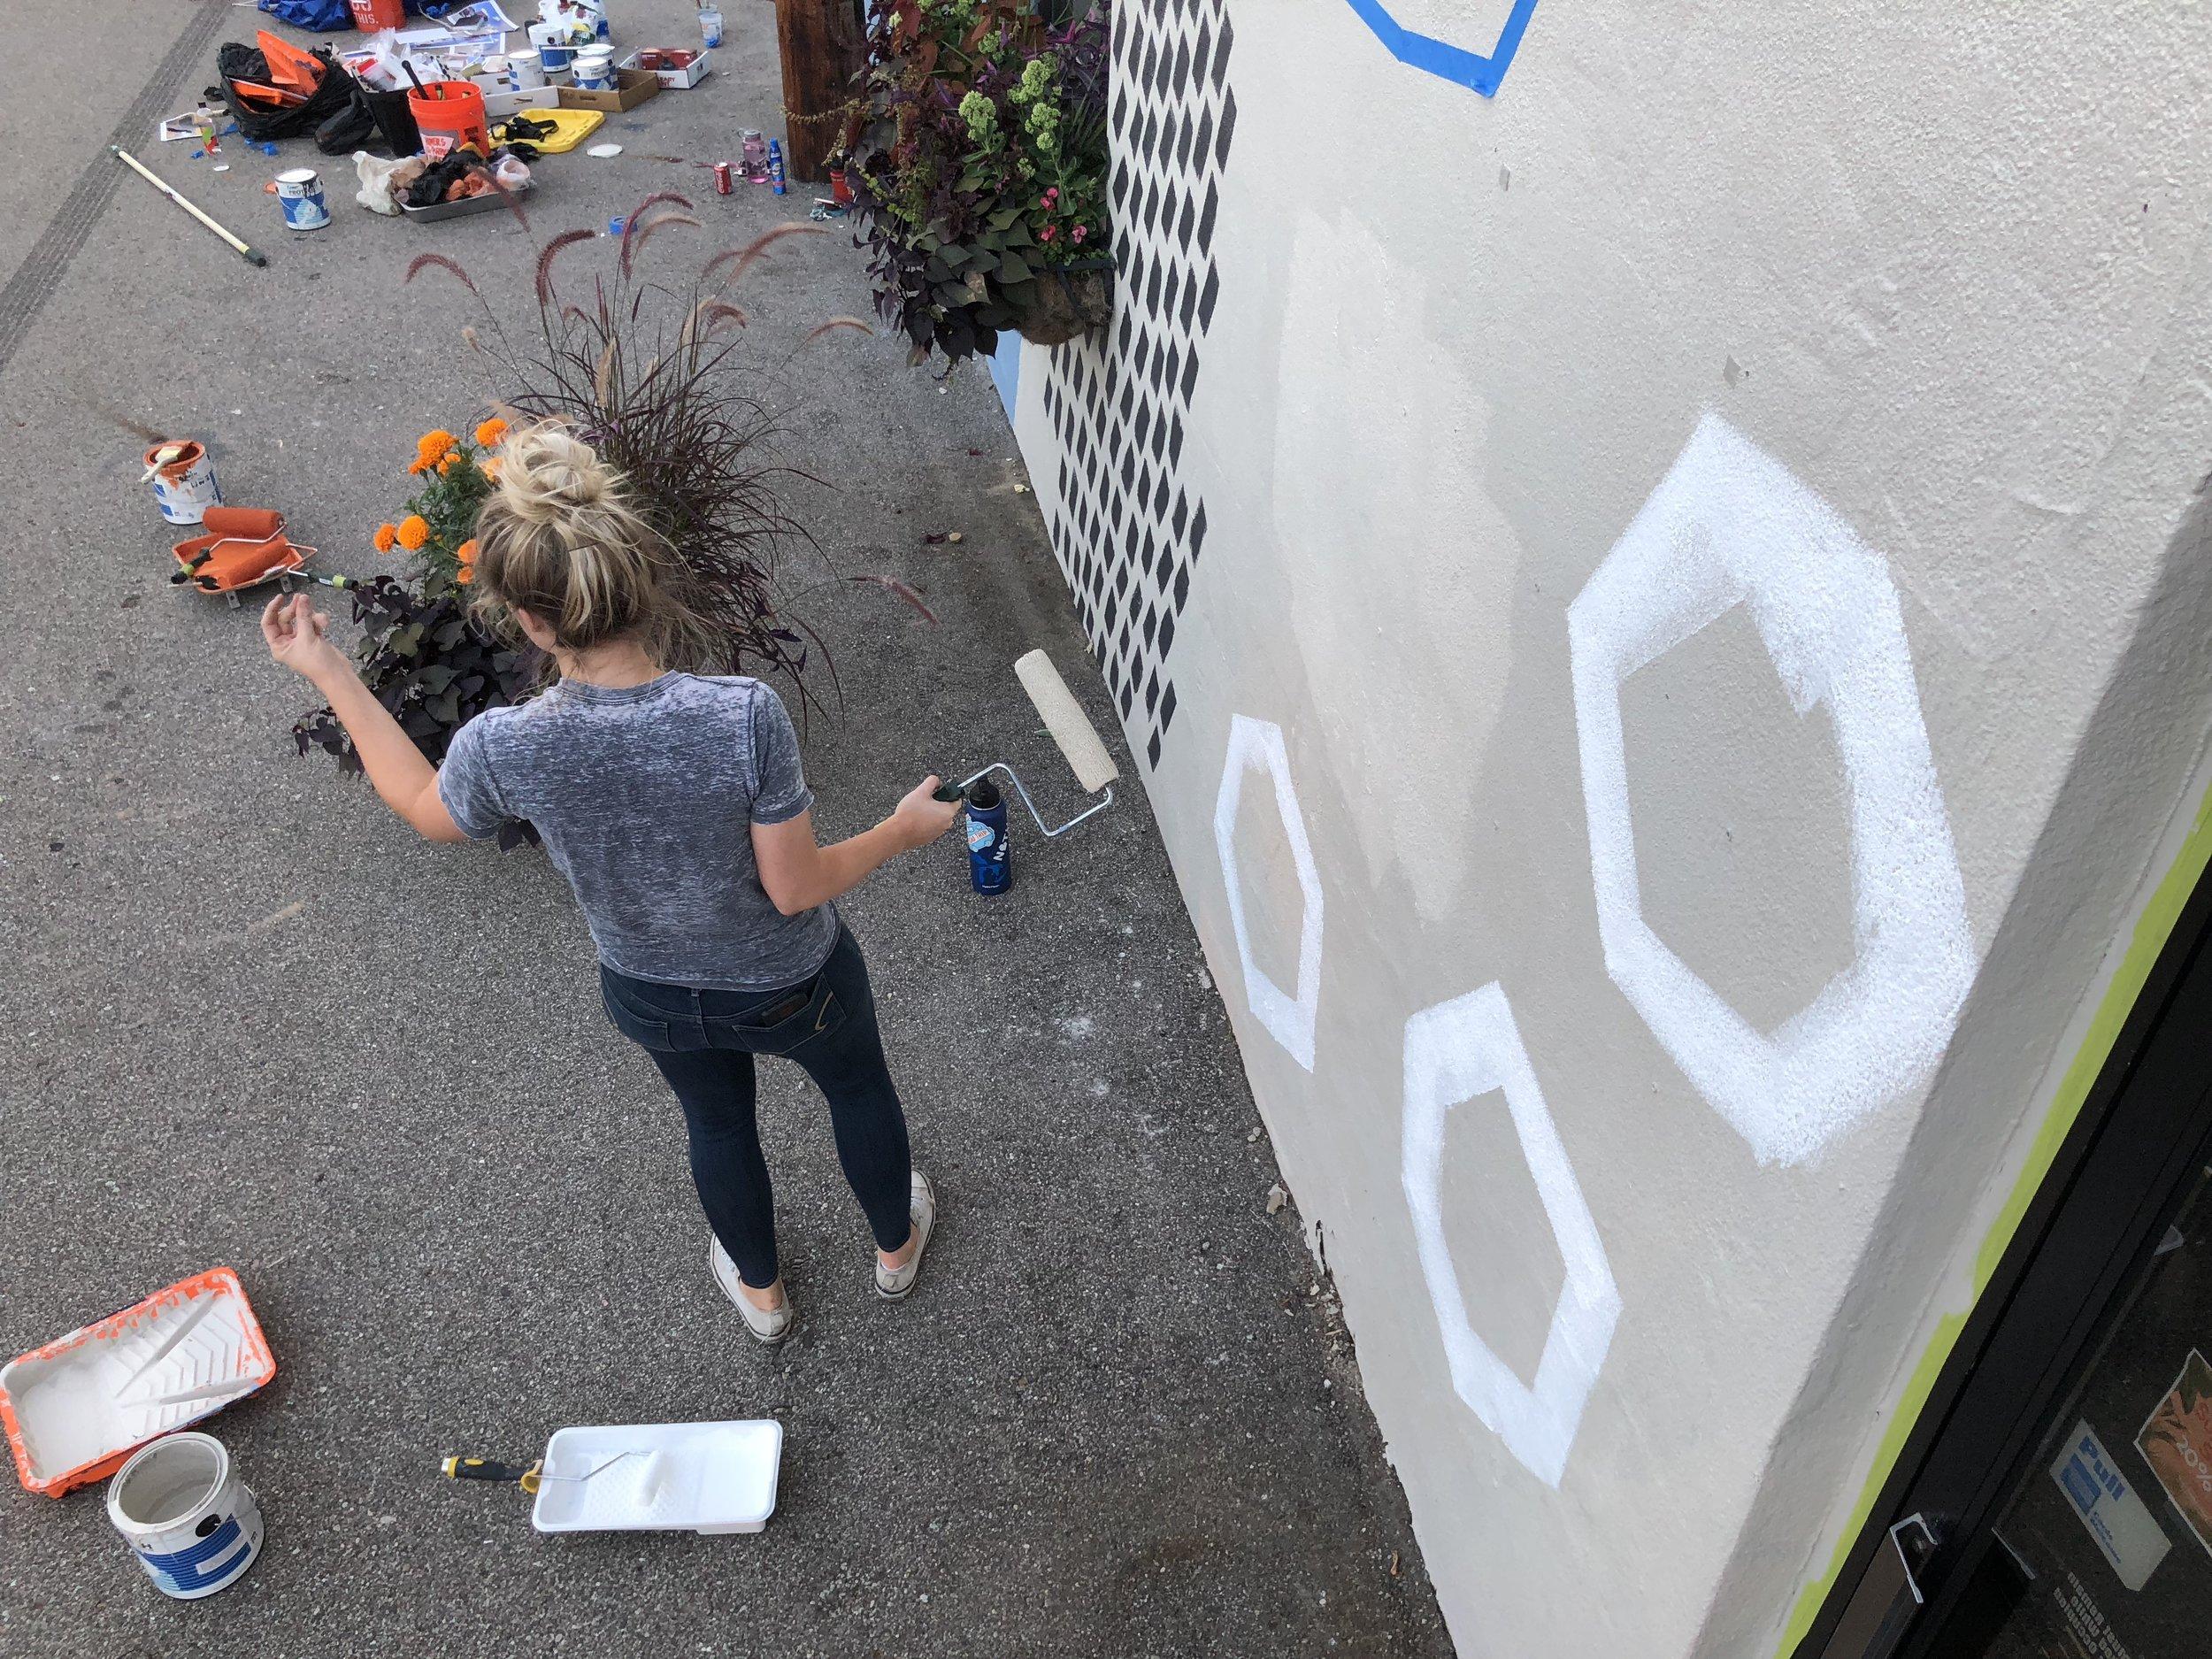 UICA Outside Creston mural in progress